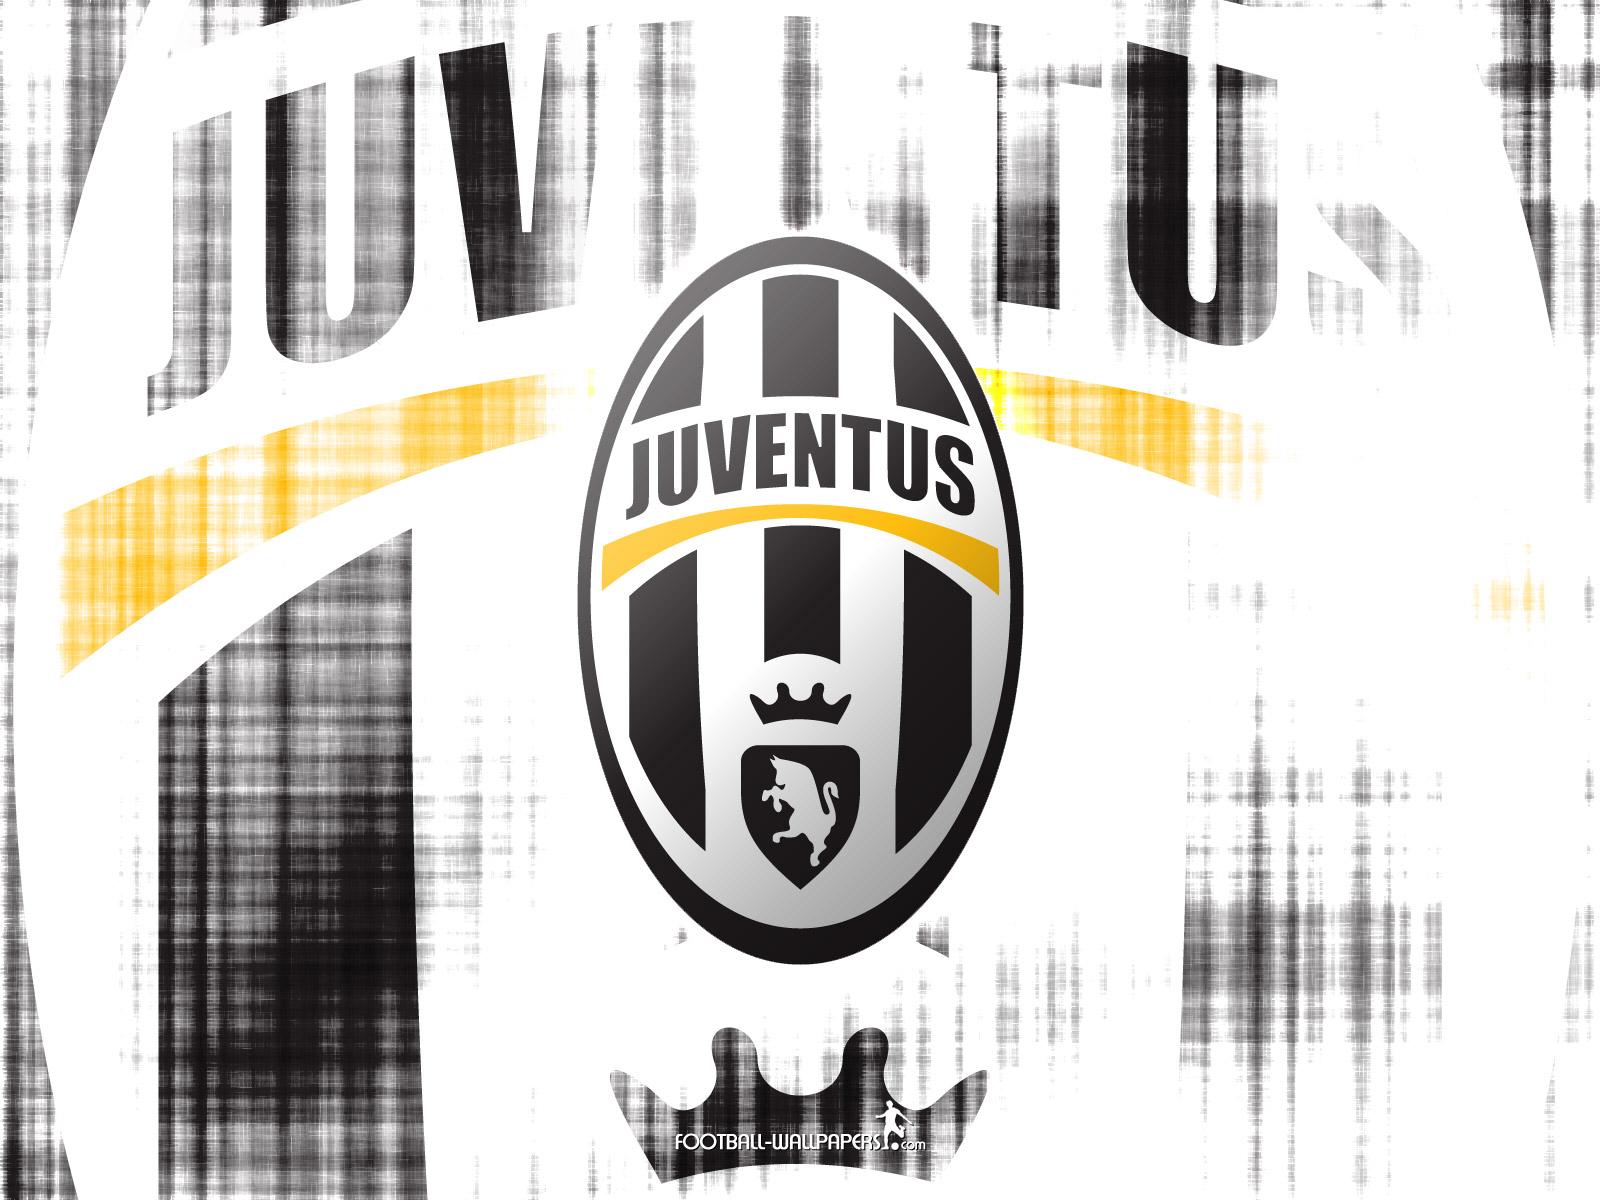 Most Inspiring Wallpaper Logo Juventus - latest?cb\u003d20130526114826  Collection_109259.jpg/revision/latest?cb\u003d20130526114826